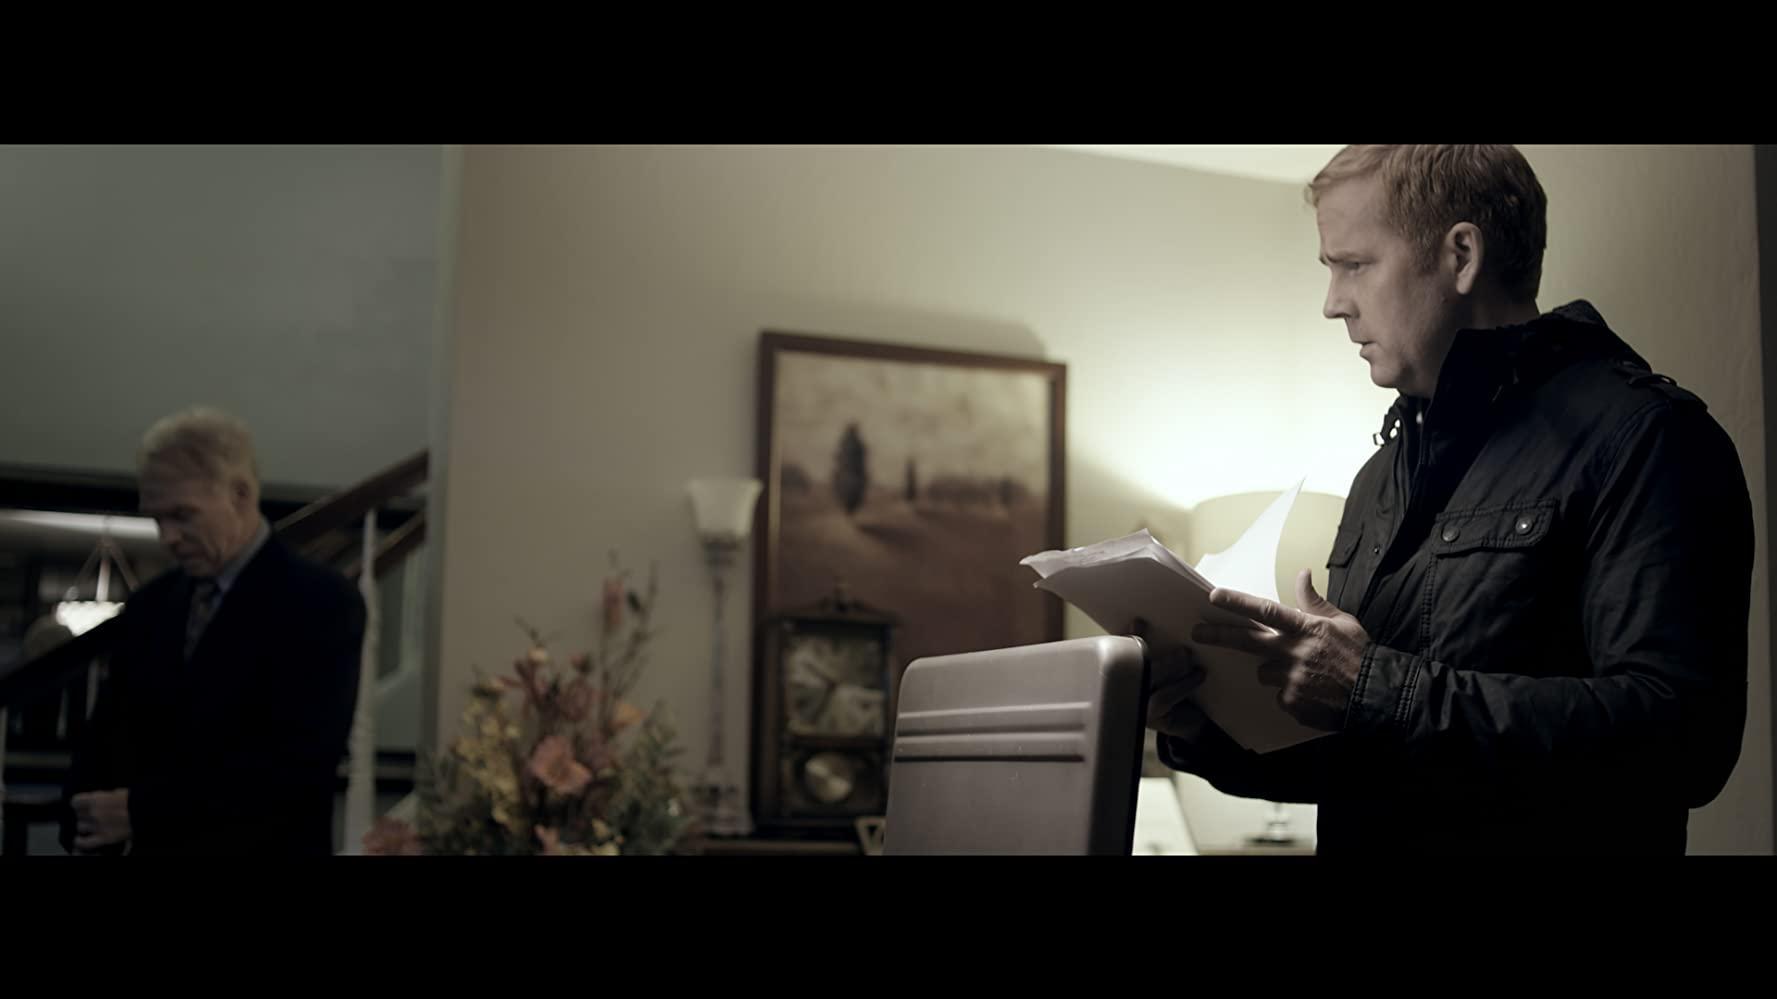 مشاهدة فيلم Interpreters (2020) مترجم HD اون لاين